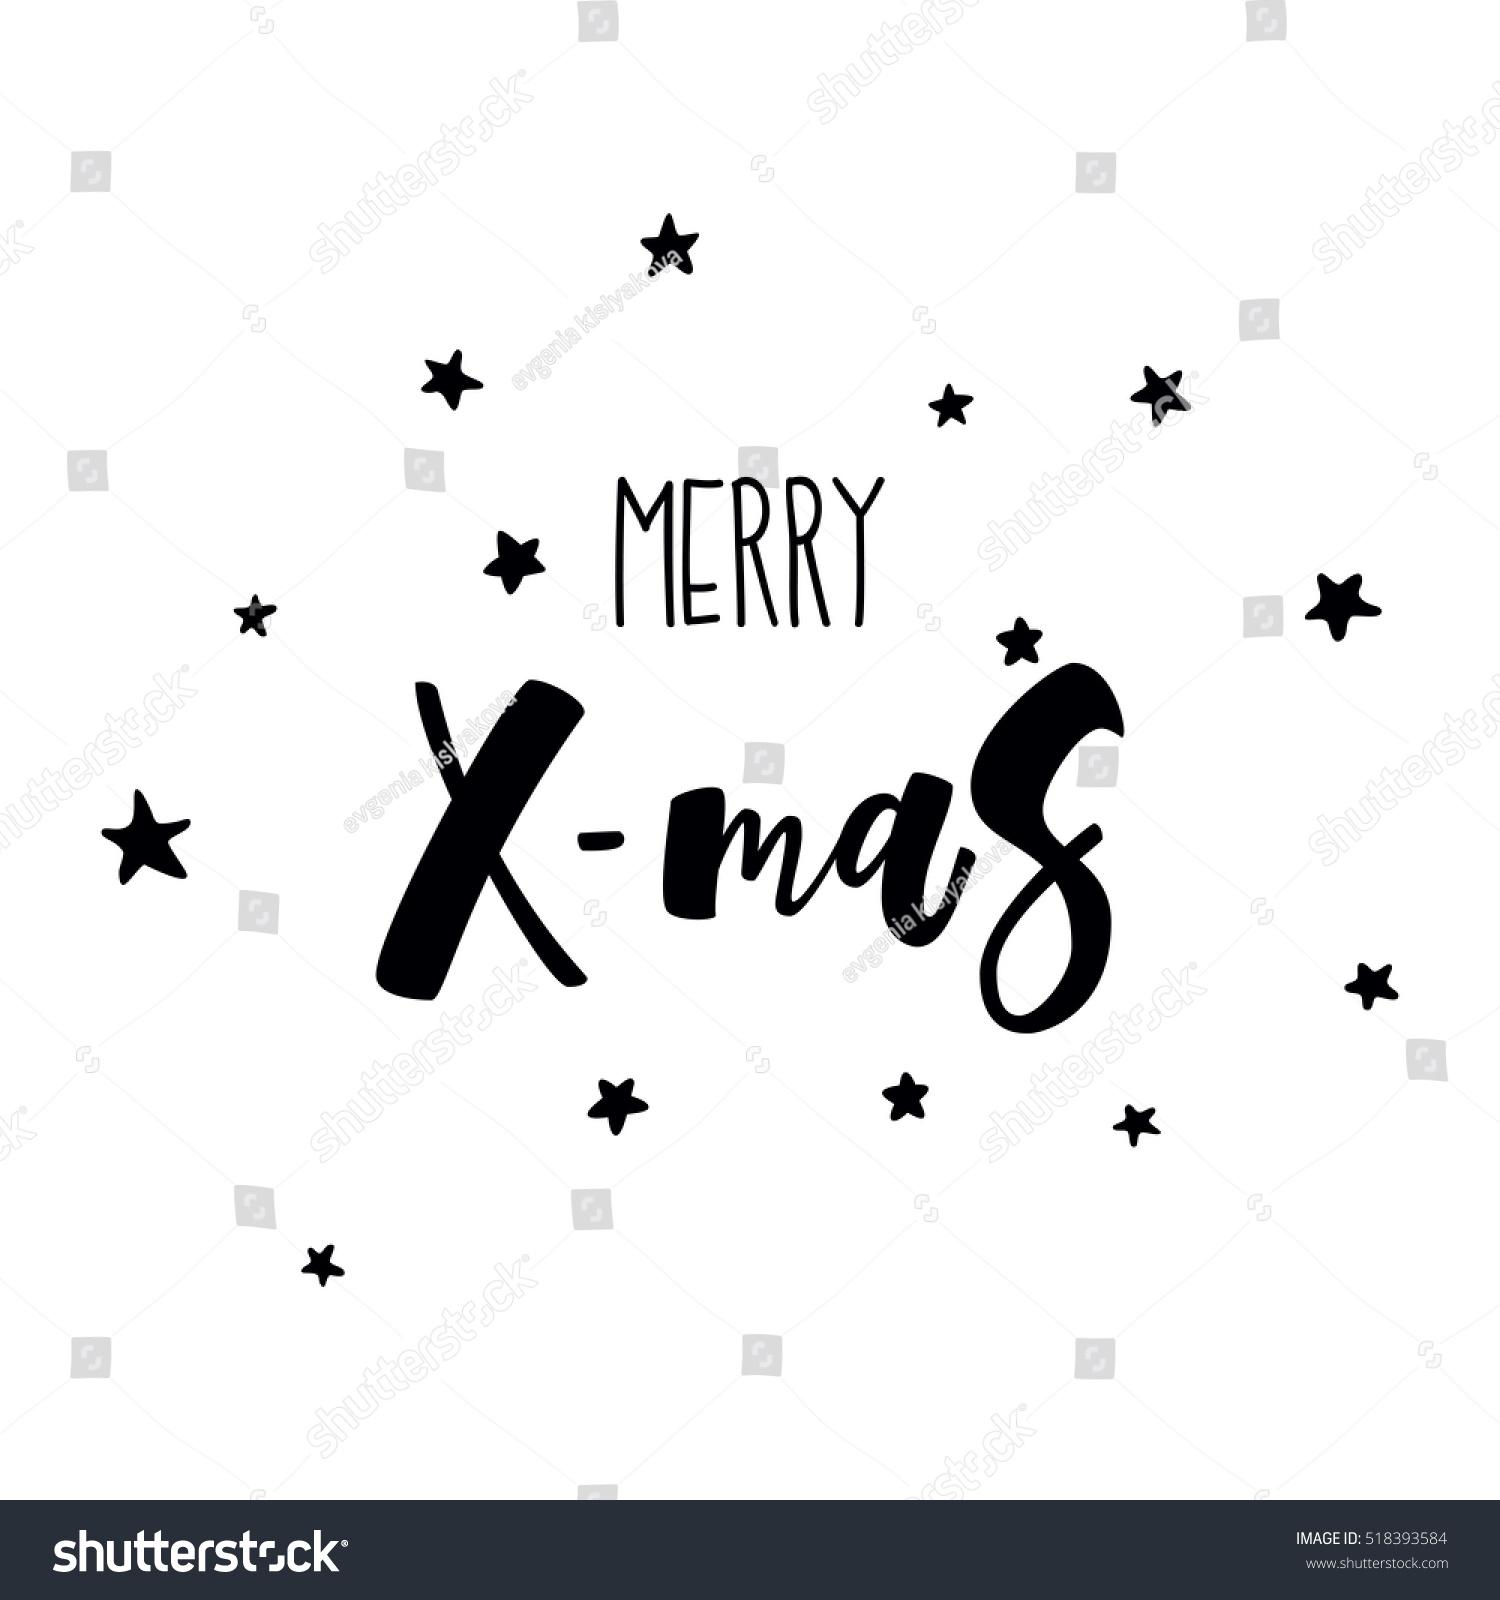 Merry Xmas Greeting Card Black White Stock Vector Royalty Free